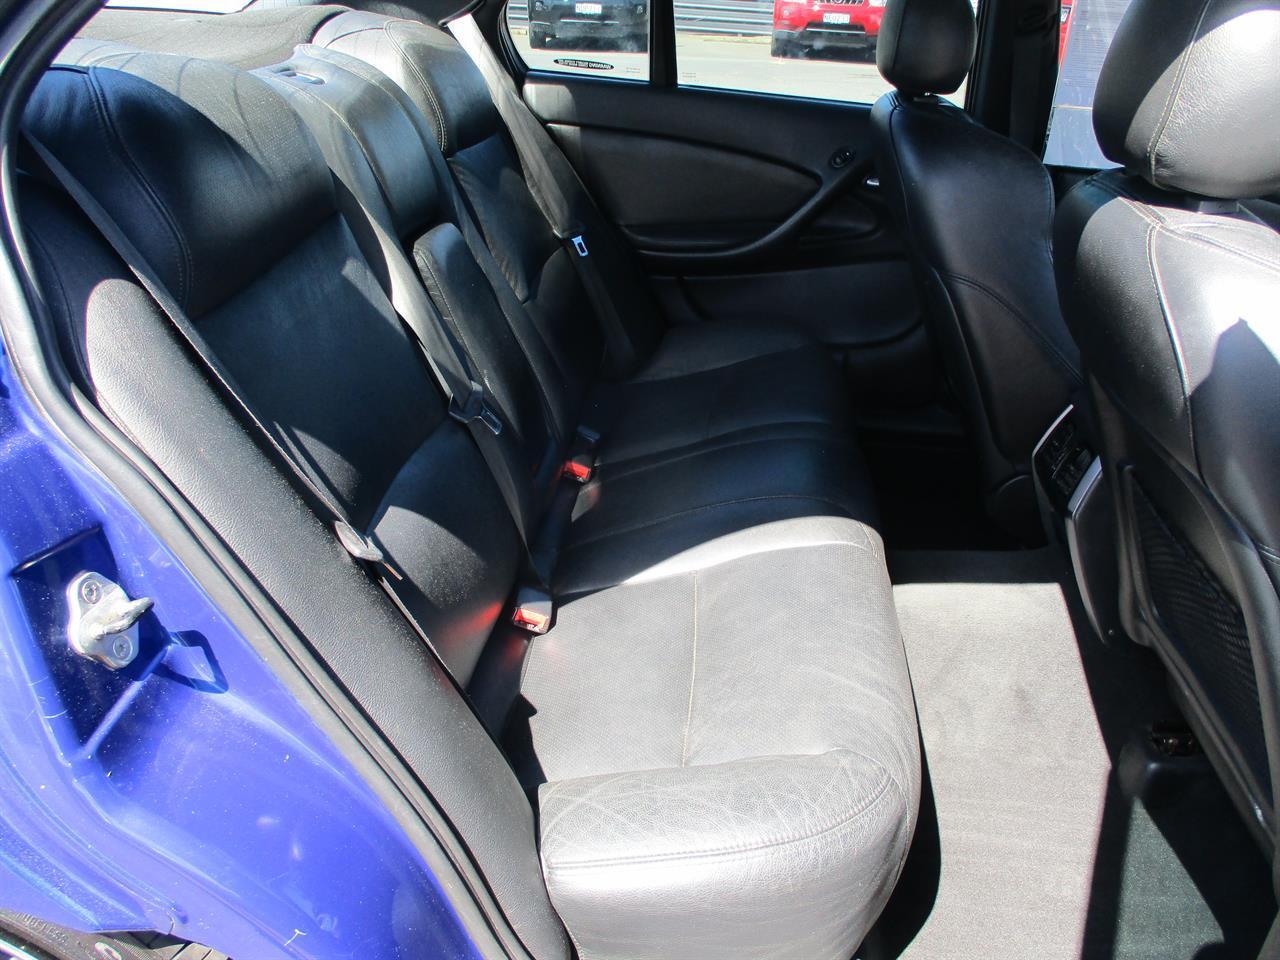 image-13, 2005 Holden Commodore VZ SS at Dunedin